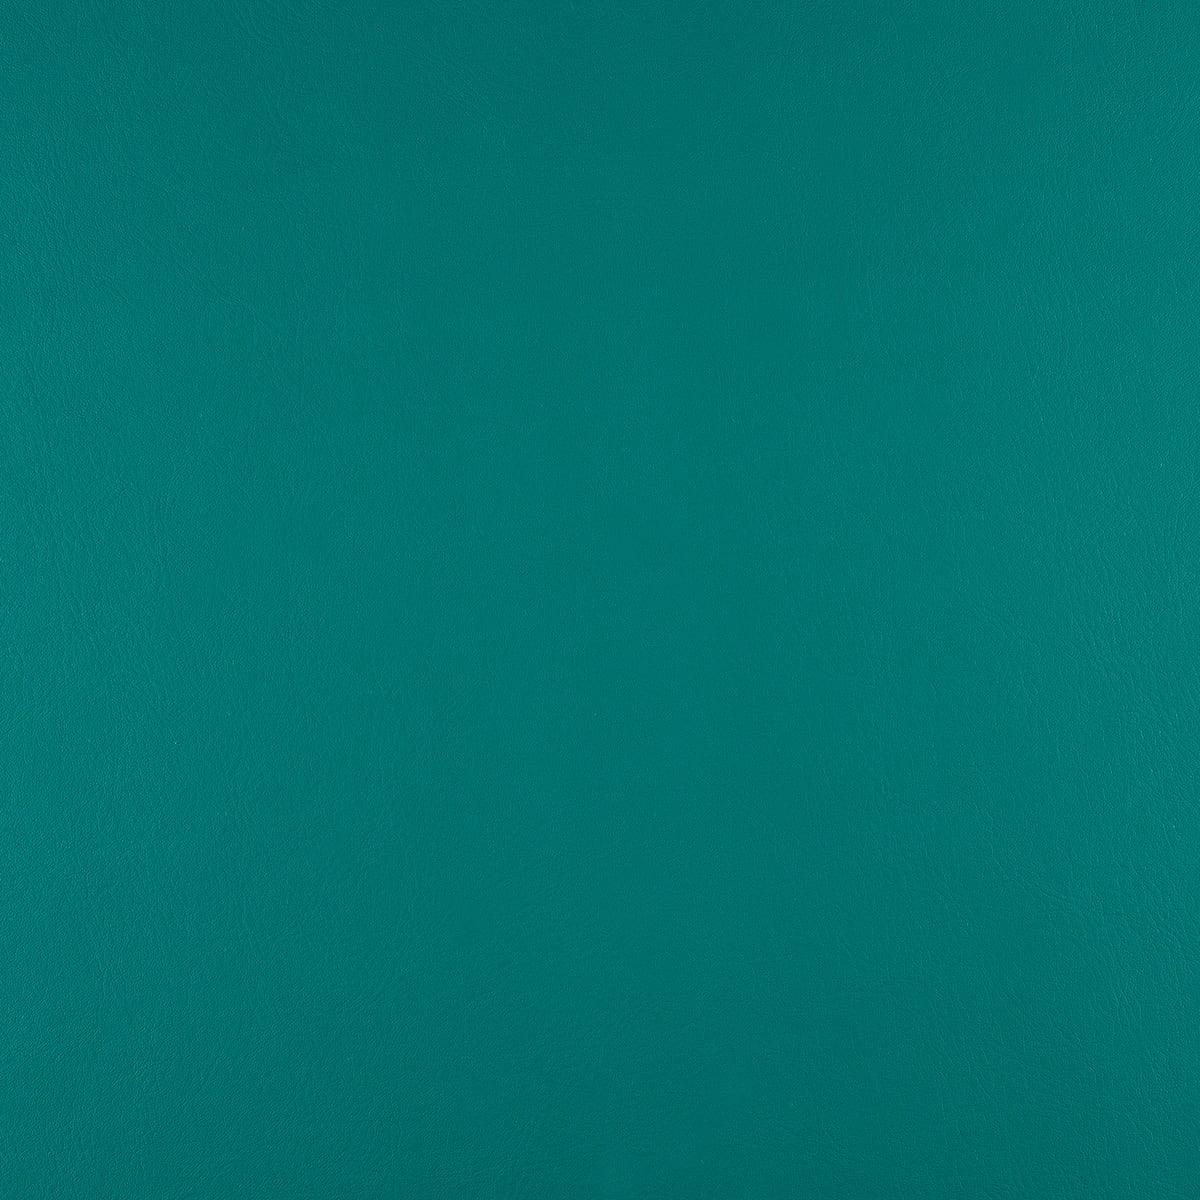 Hazard Wallpaper Hd Sea Green Chieftain Fabrics